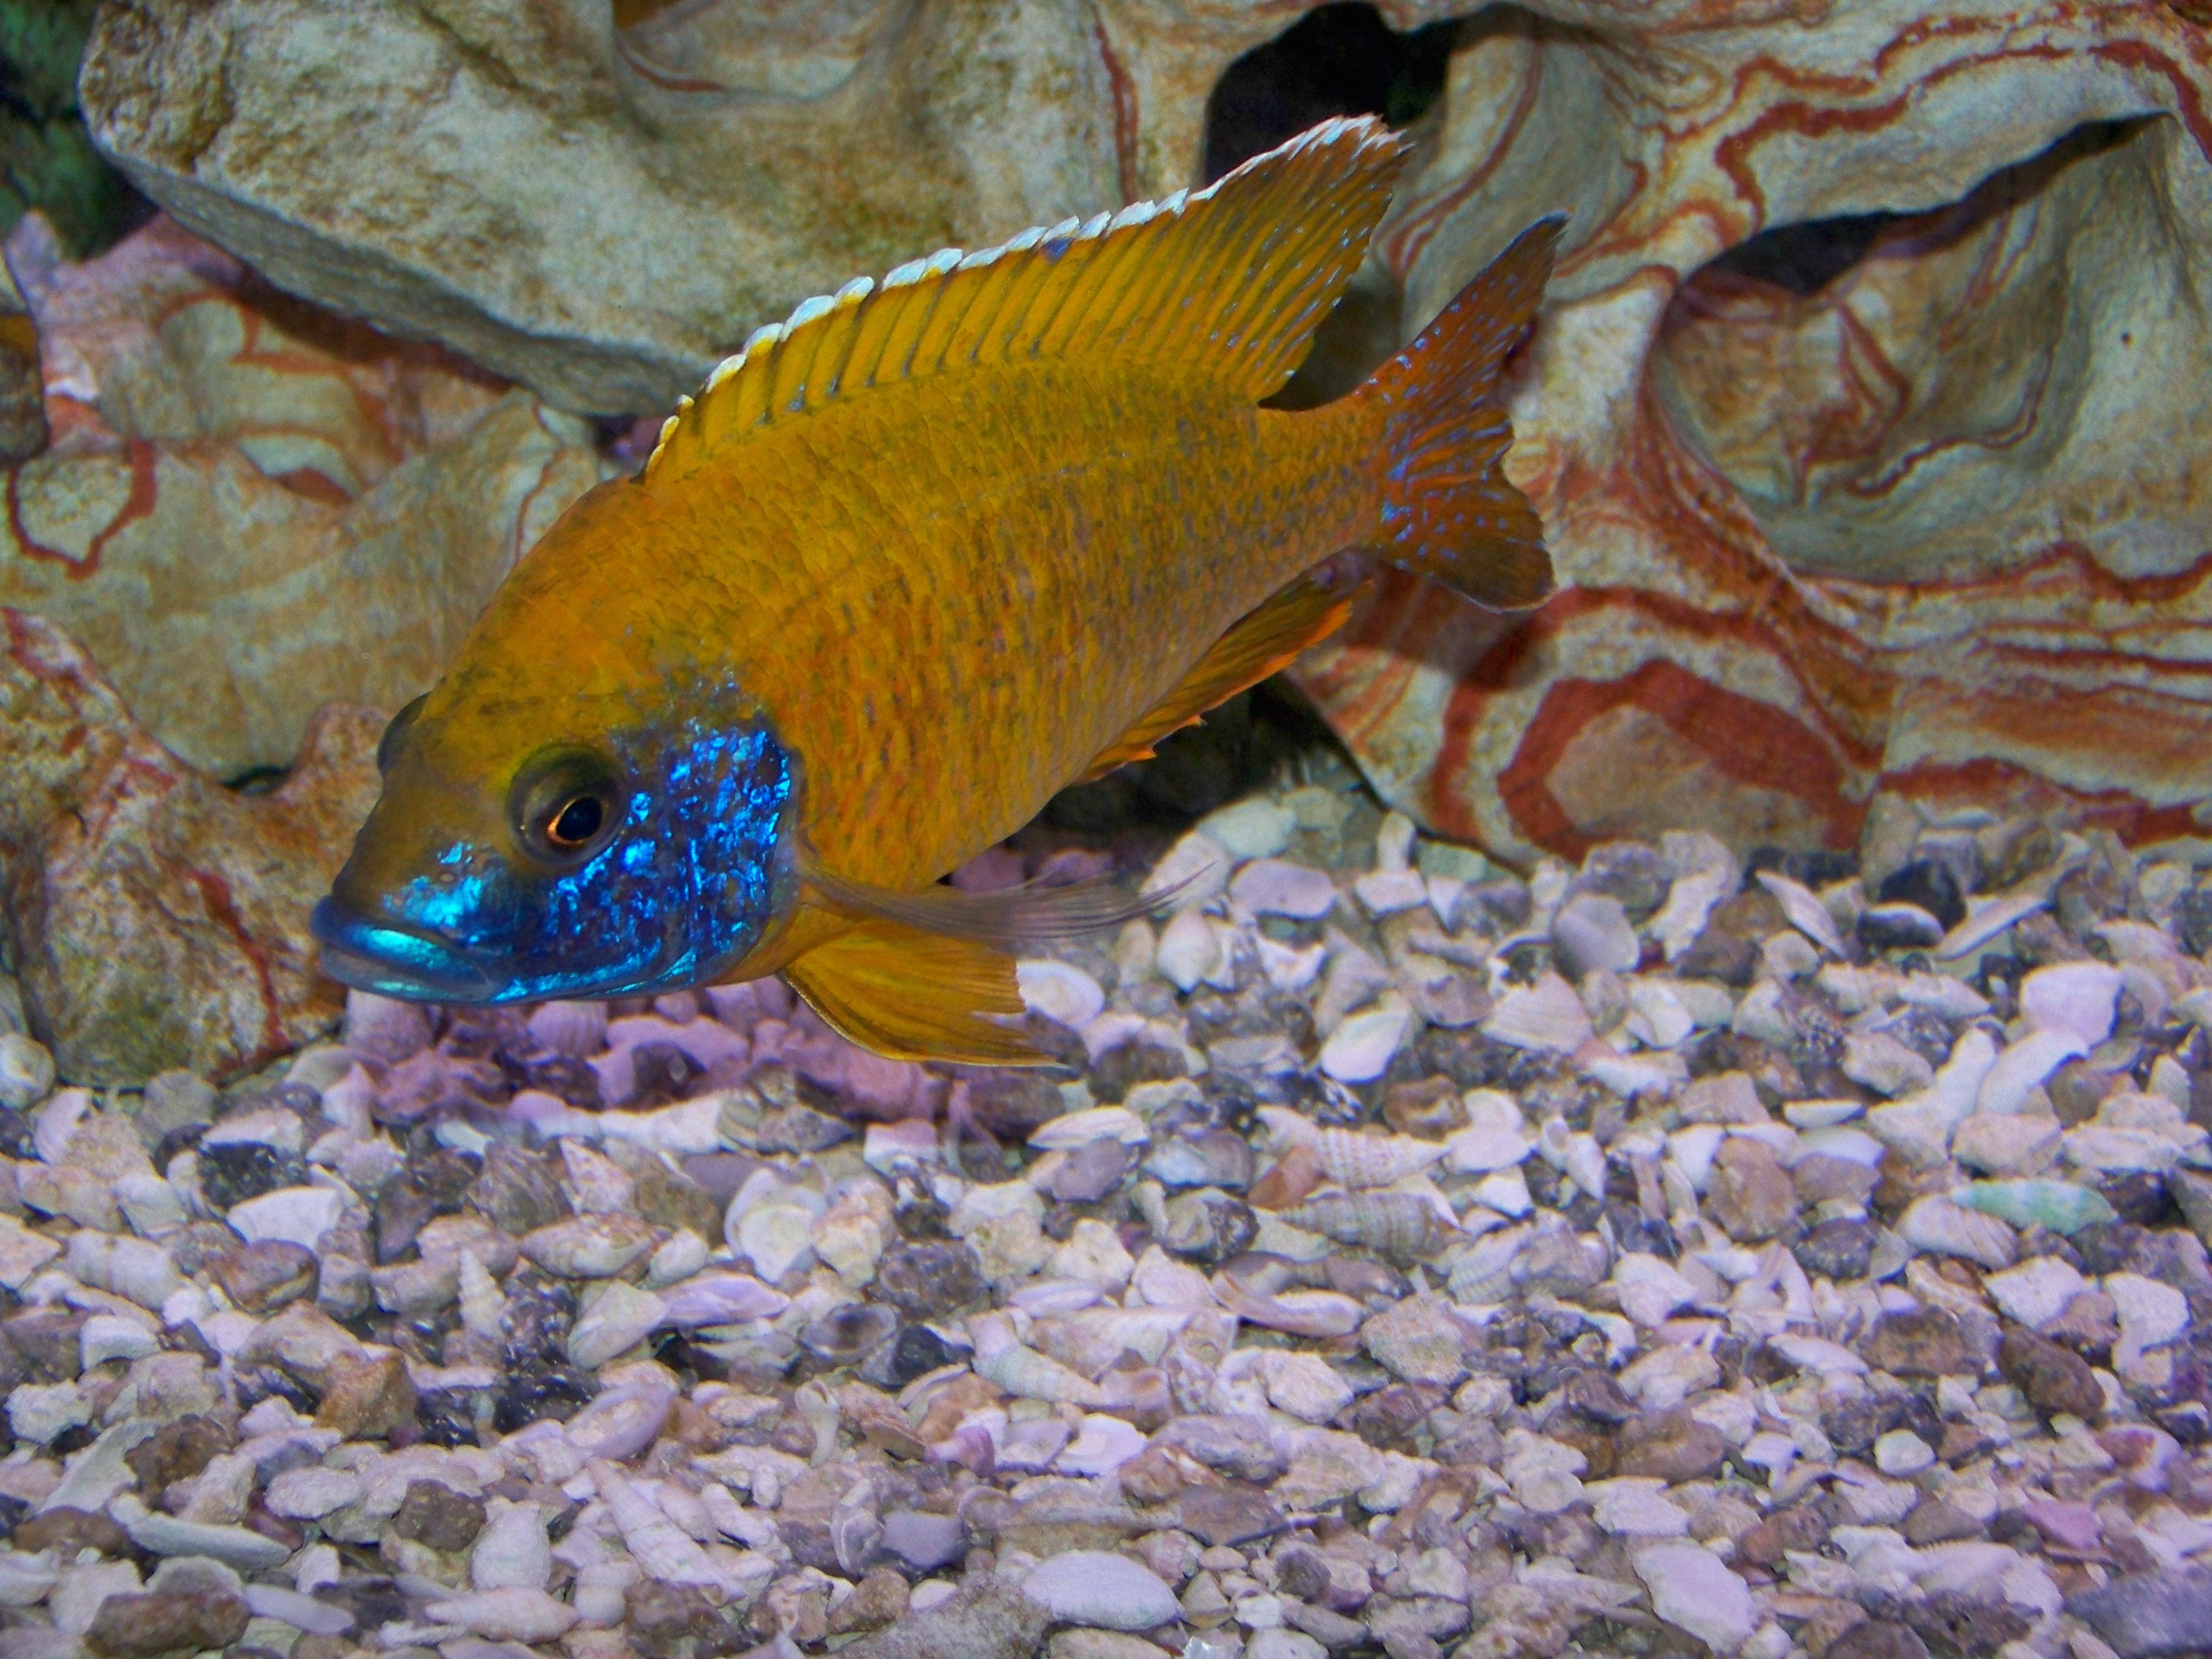 Lakes, Malawi cichlids and Cichlids on Pinterest